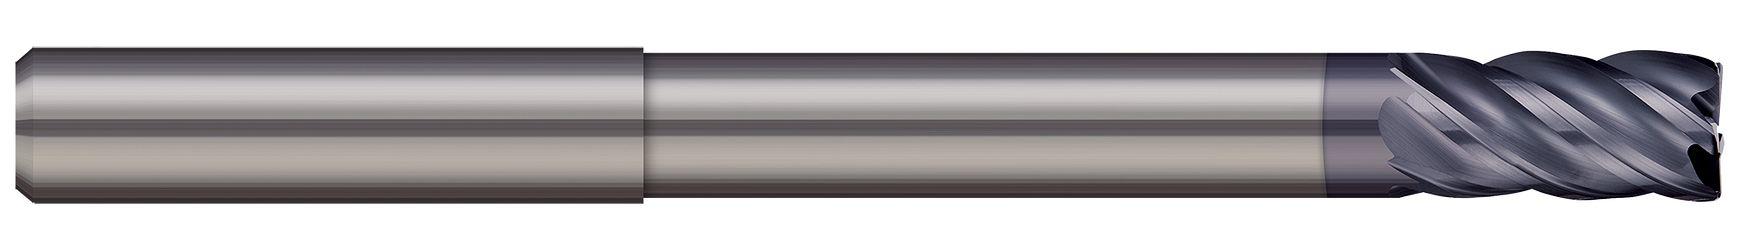 Corner Radius - 5 Flute - Variable Helix - Long Reach - Reduced Neck